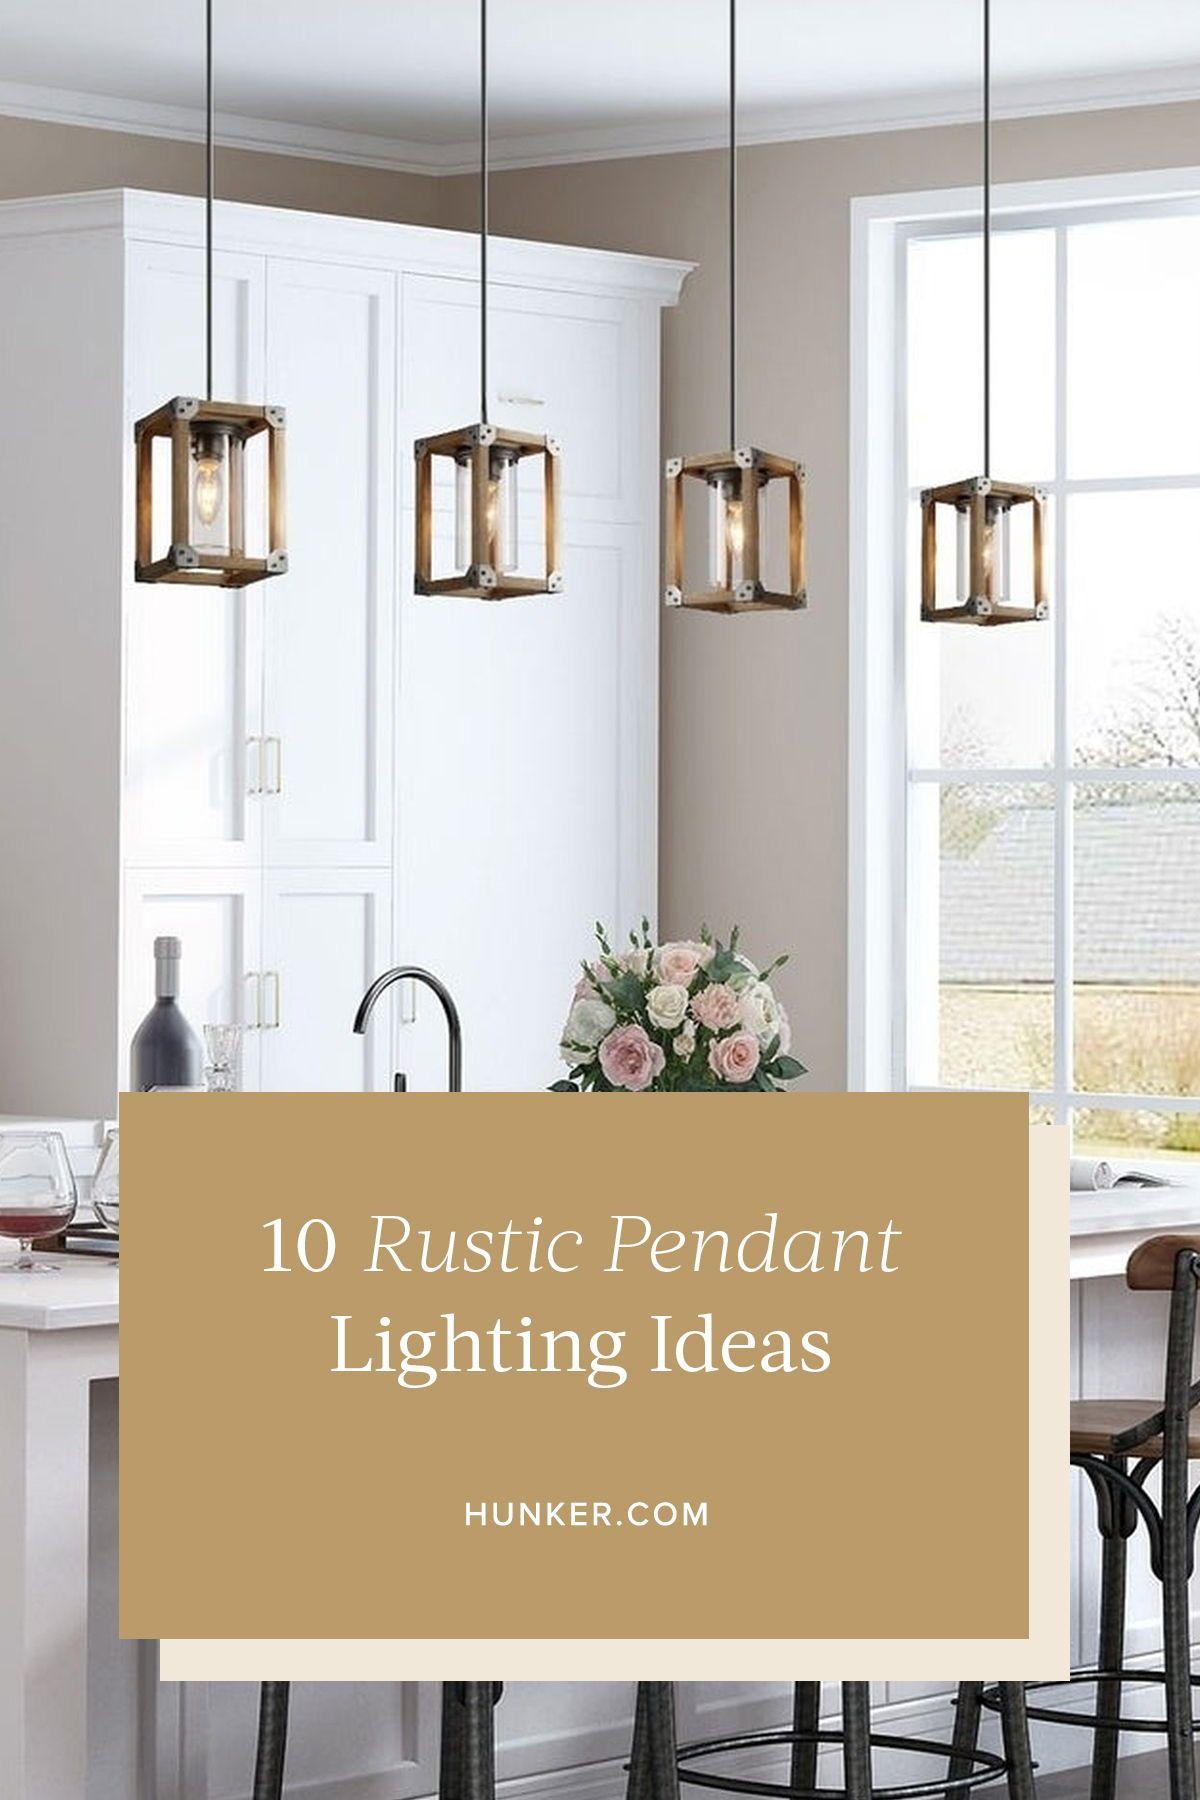 10 rustic pendant lighting ideas to